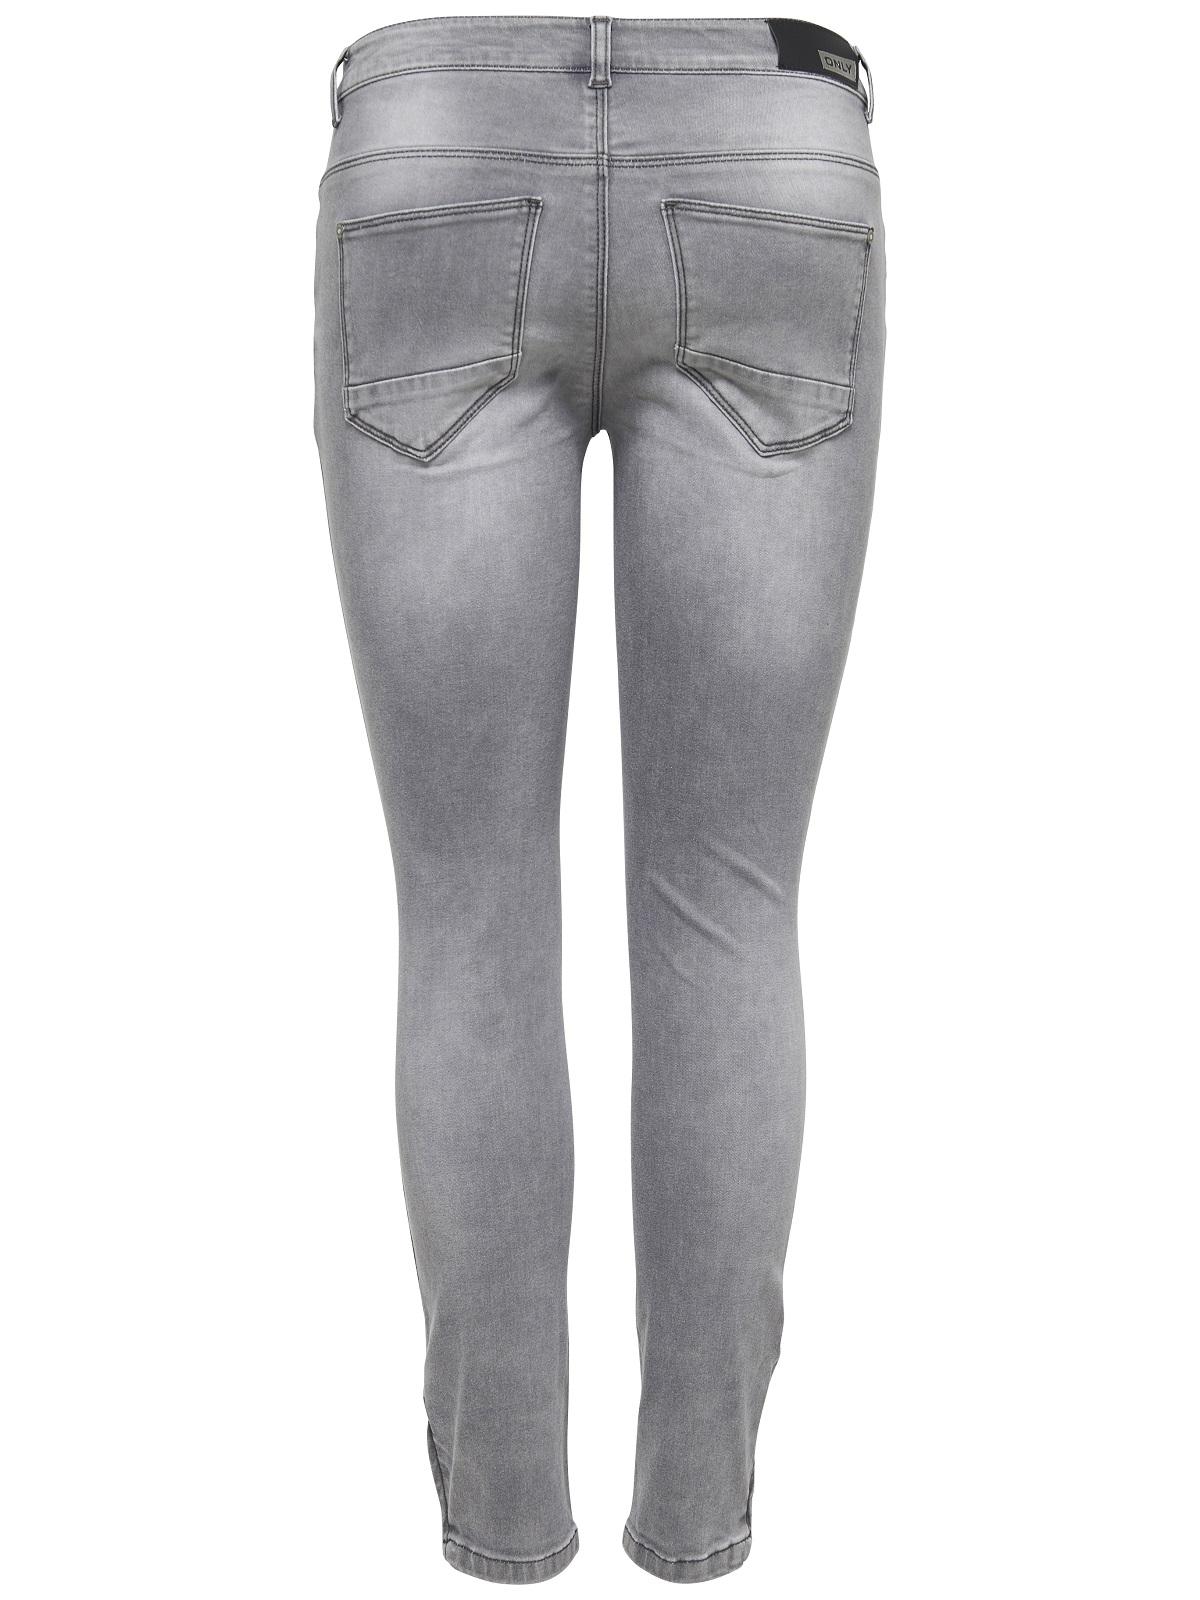 ef279320e38197 Only Damen-Hose onlKendell REG SK ANK Regular Skinny Jeans 15112539 grau NEU